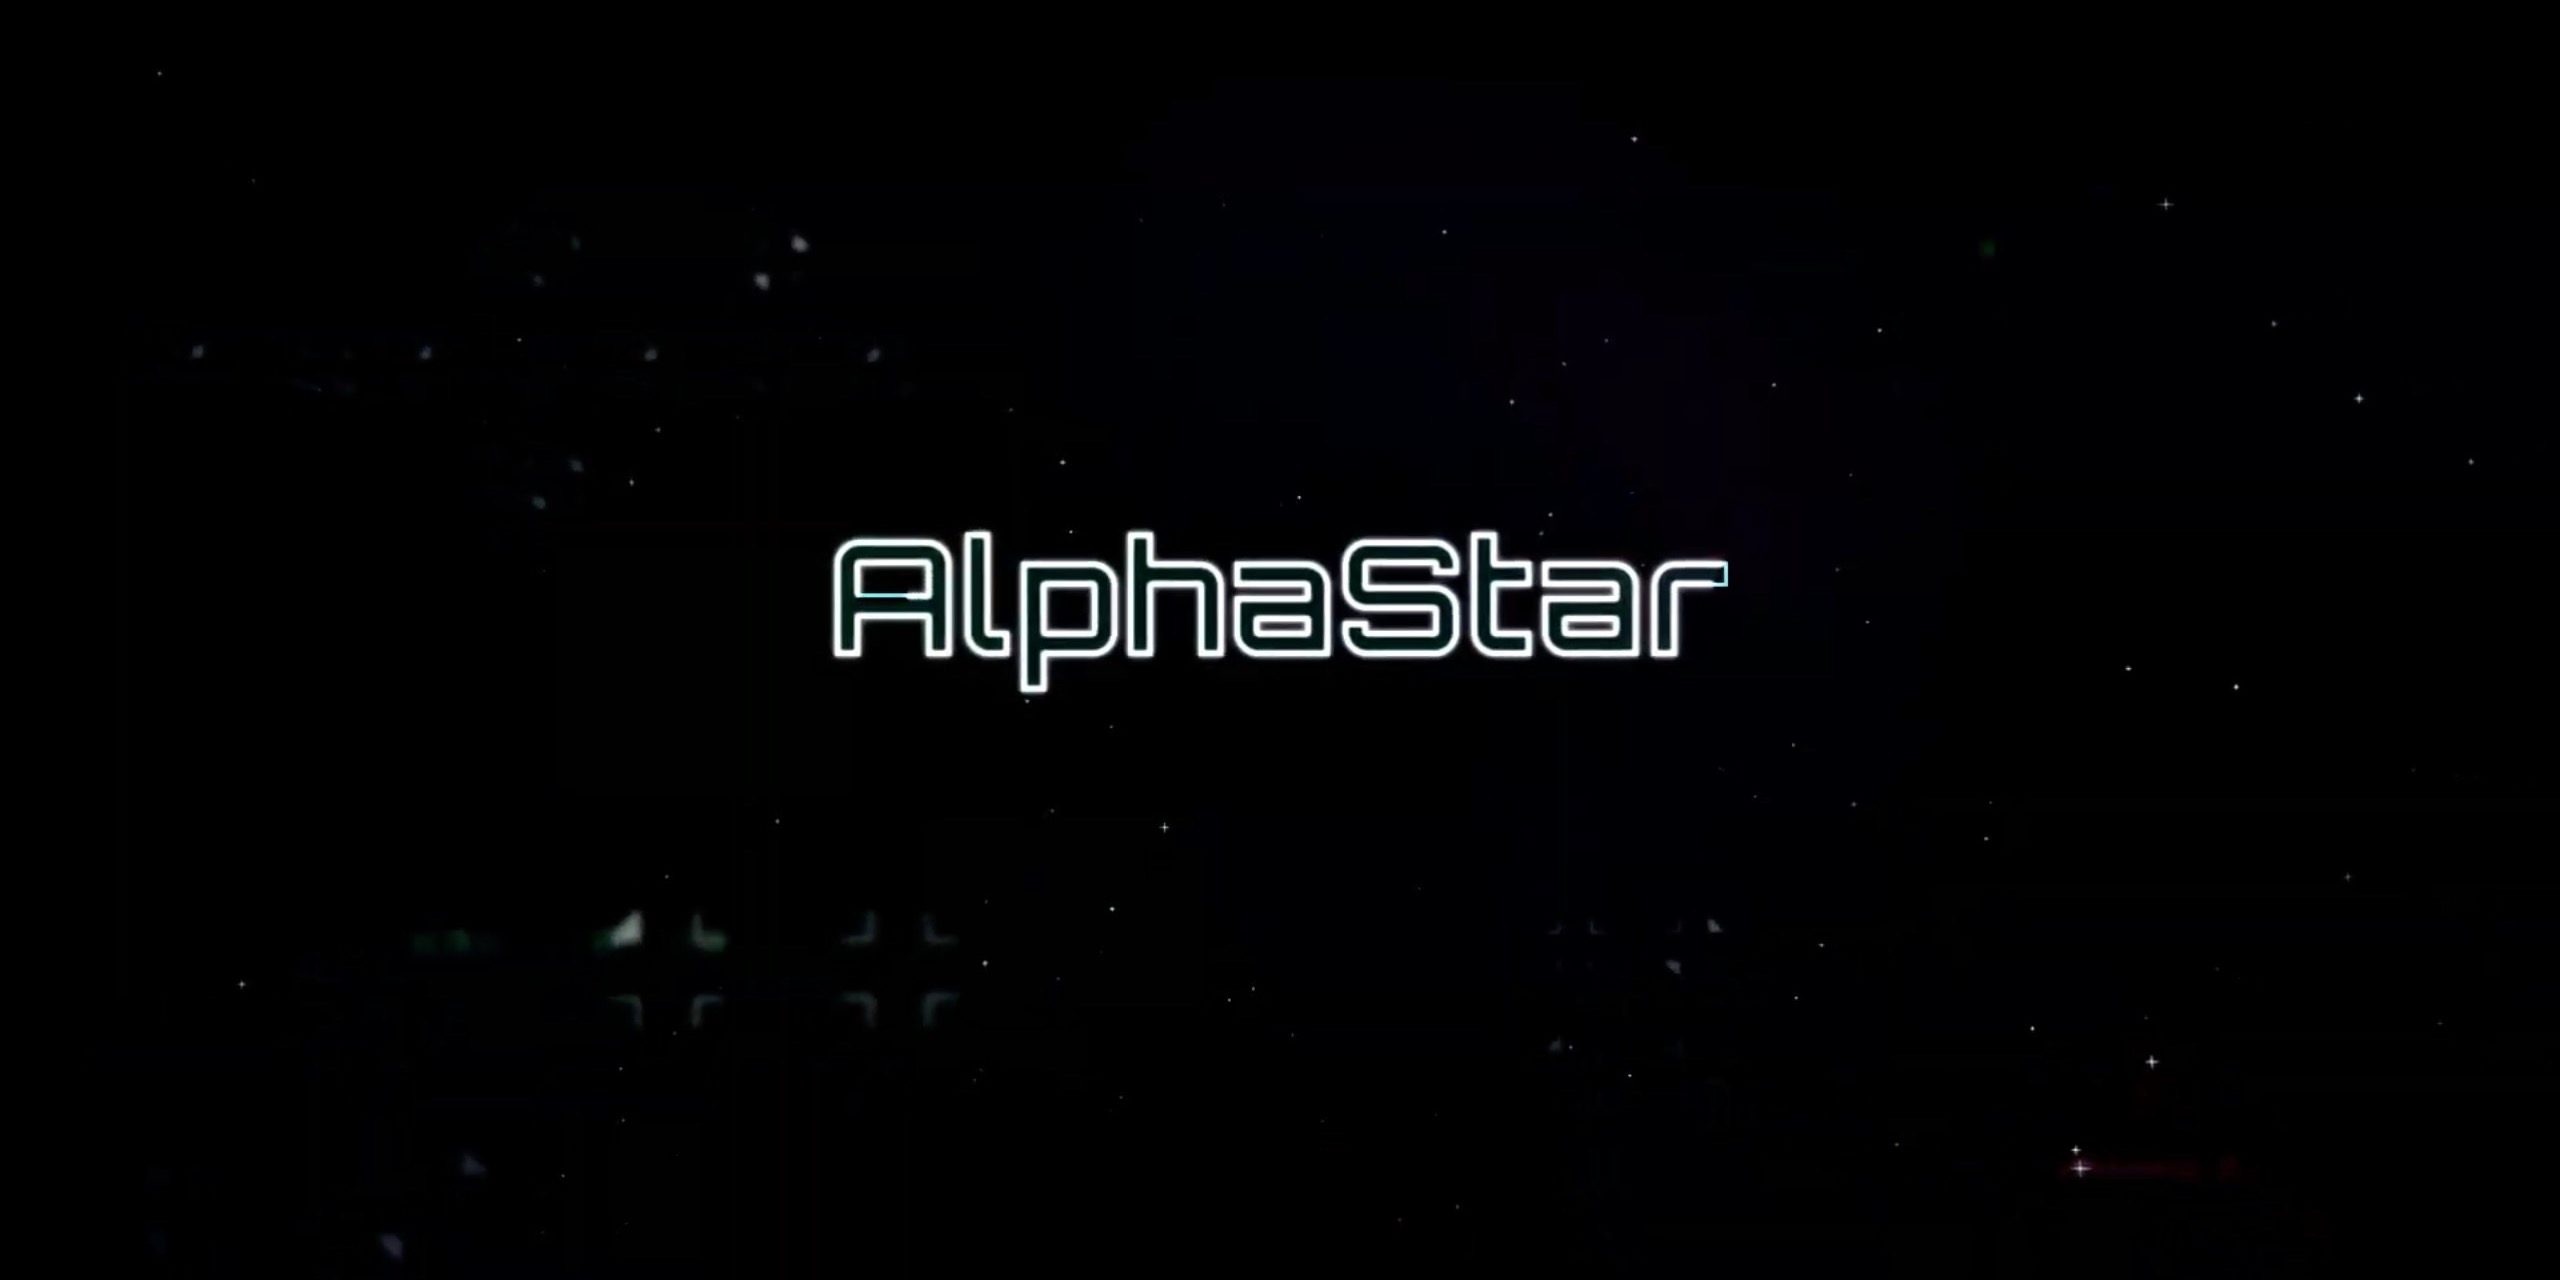 DeepMind's AlphaStar AI wins 10-1 against professional StarCraft II players